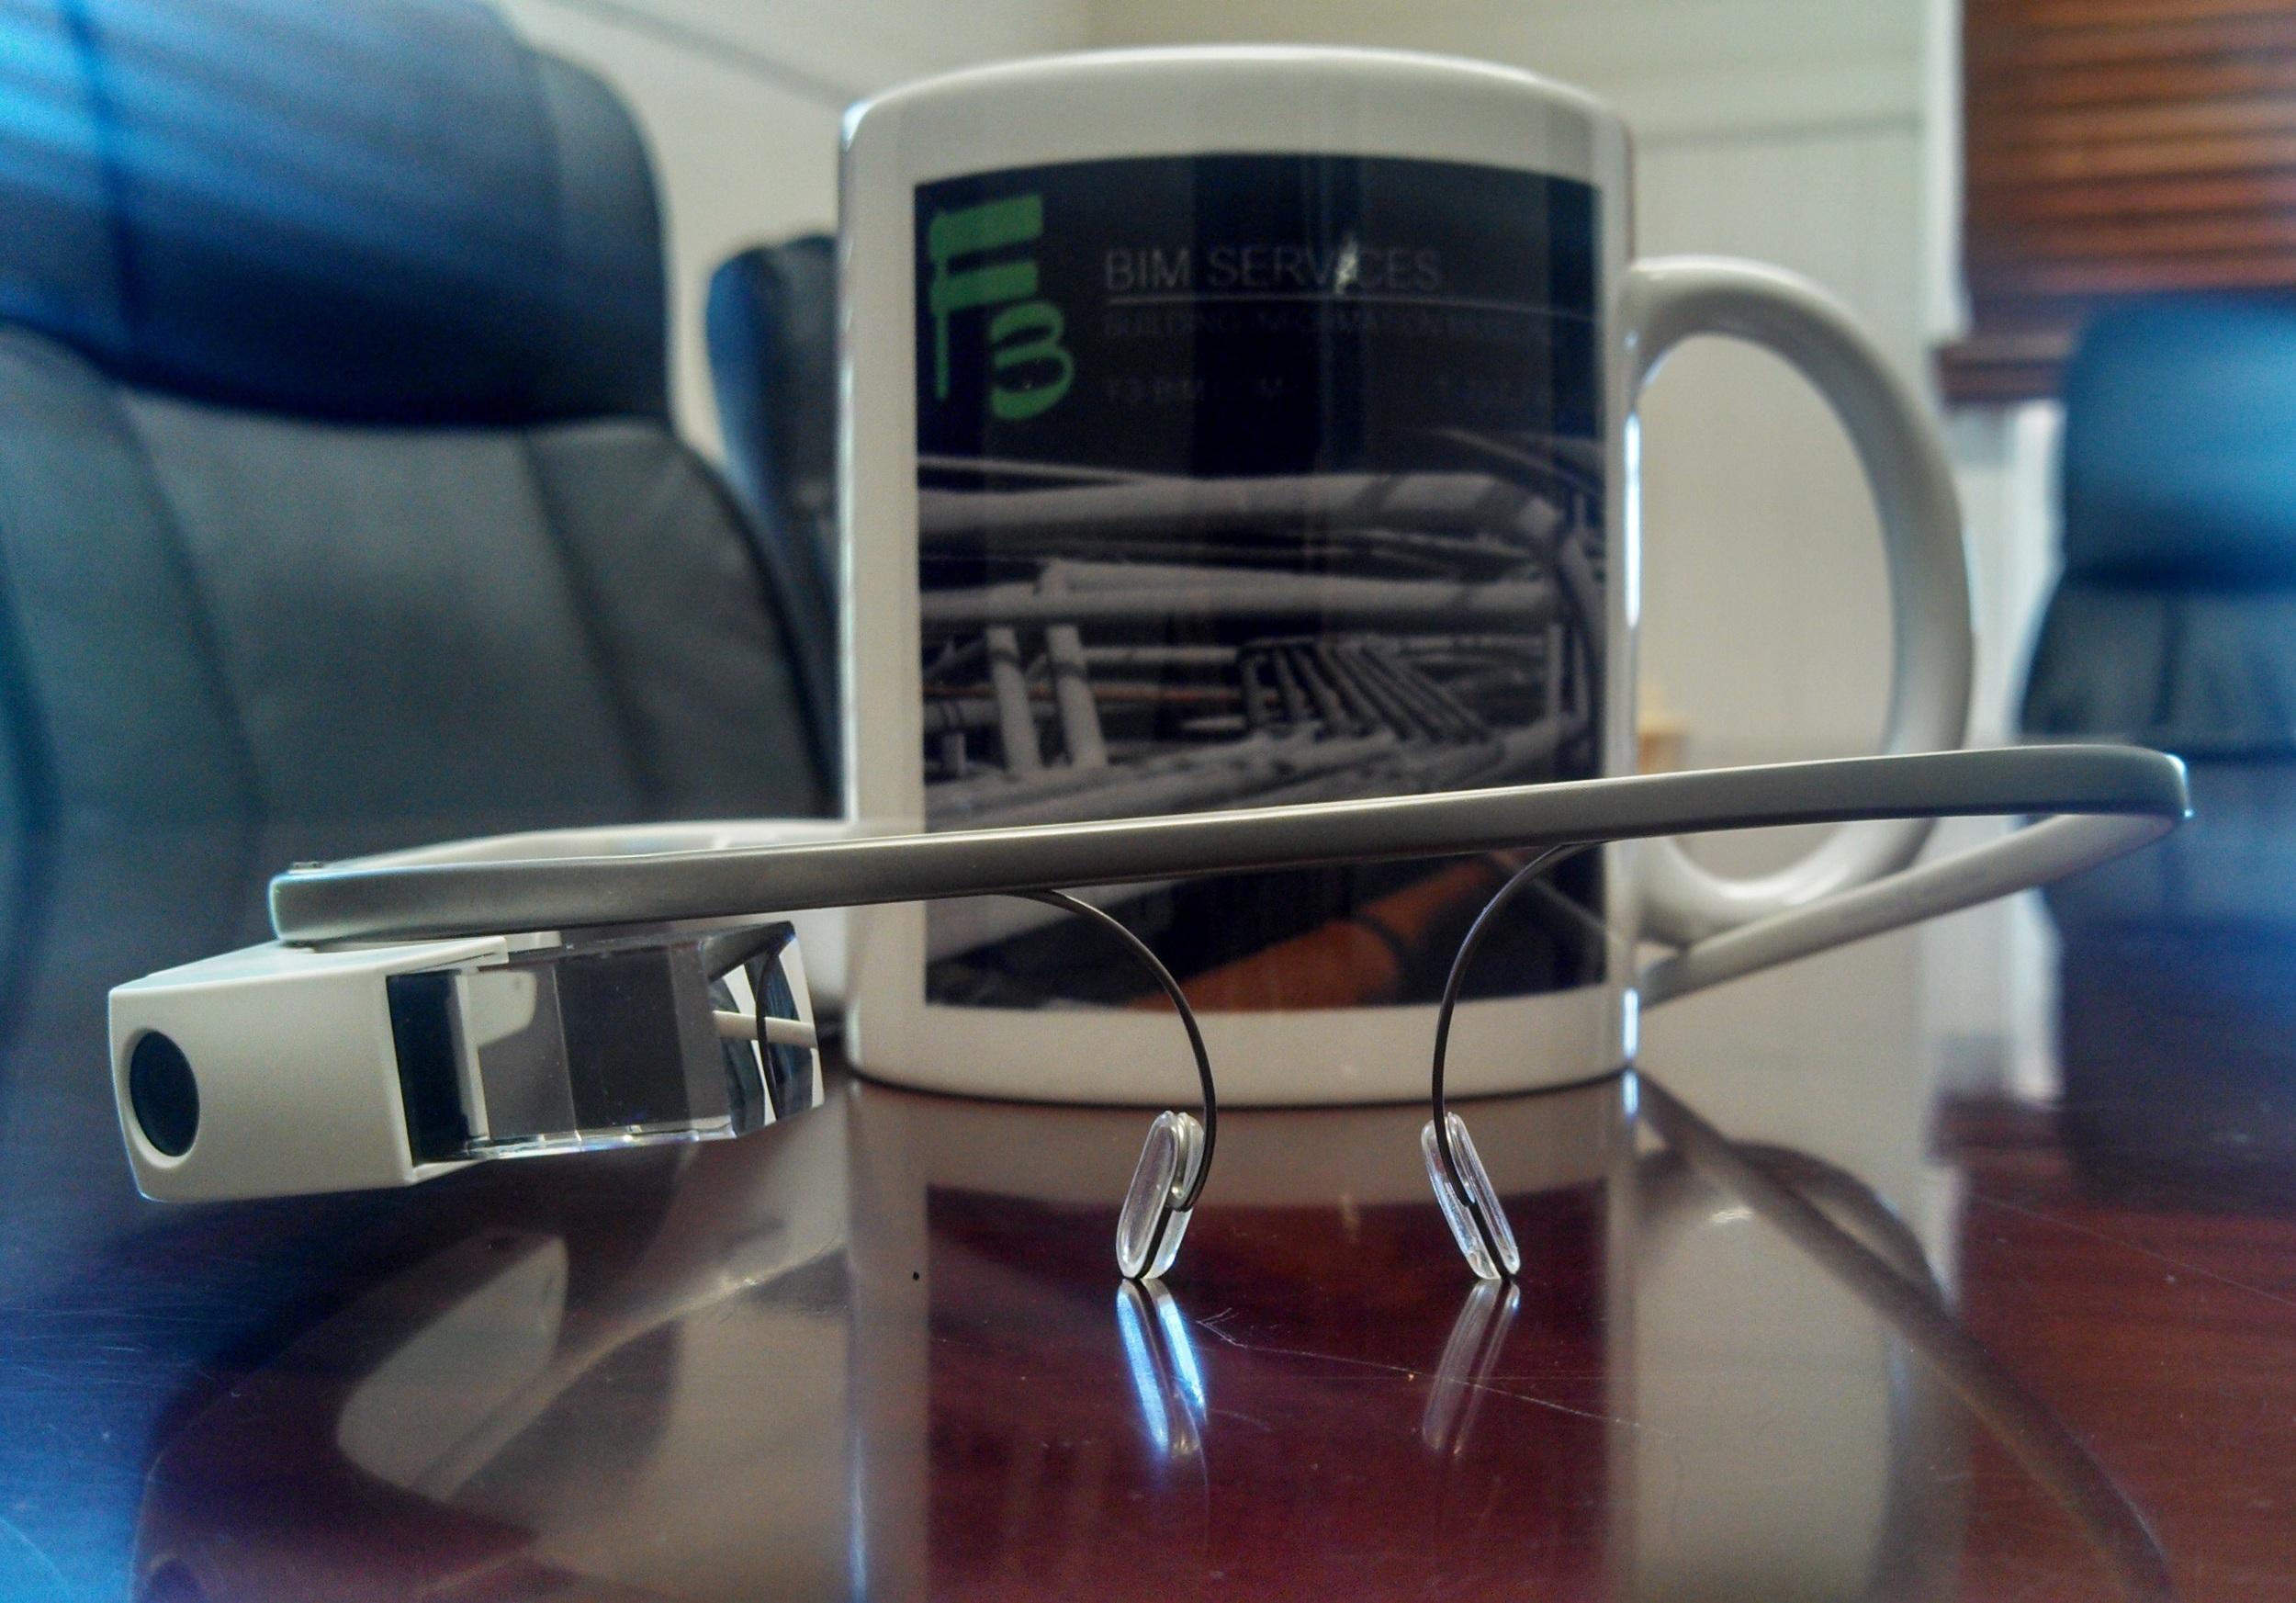 The F3 Google Glass #Awesomenessness